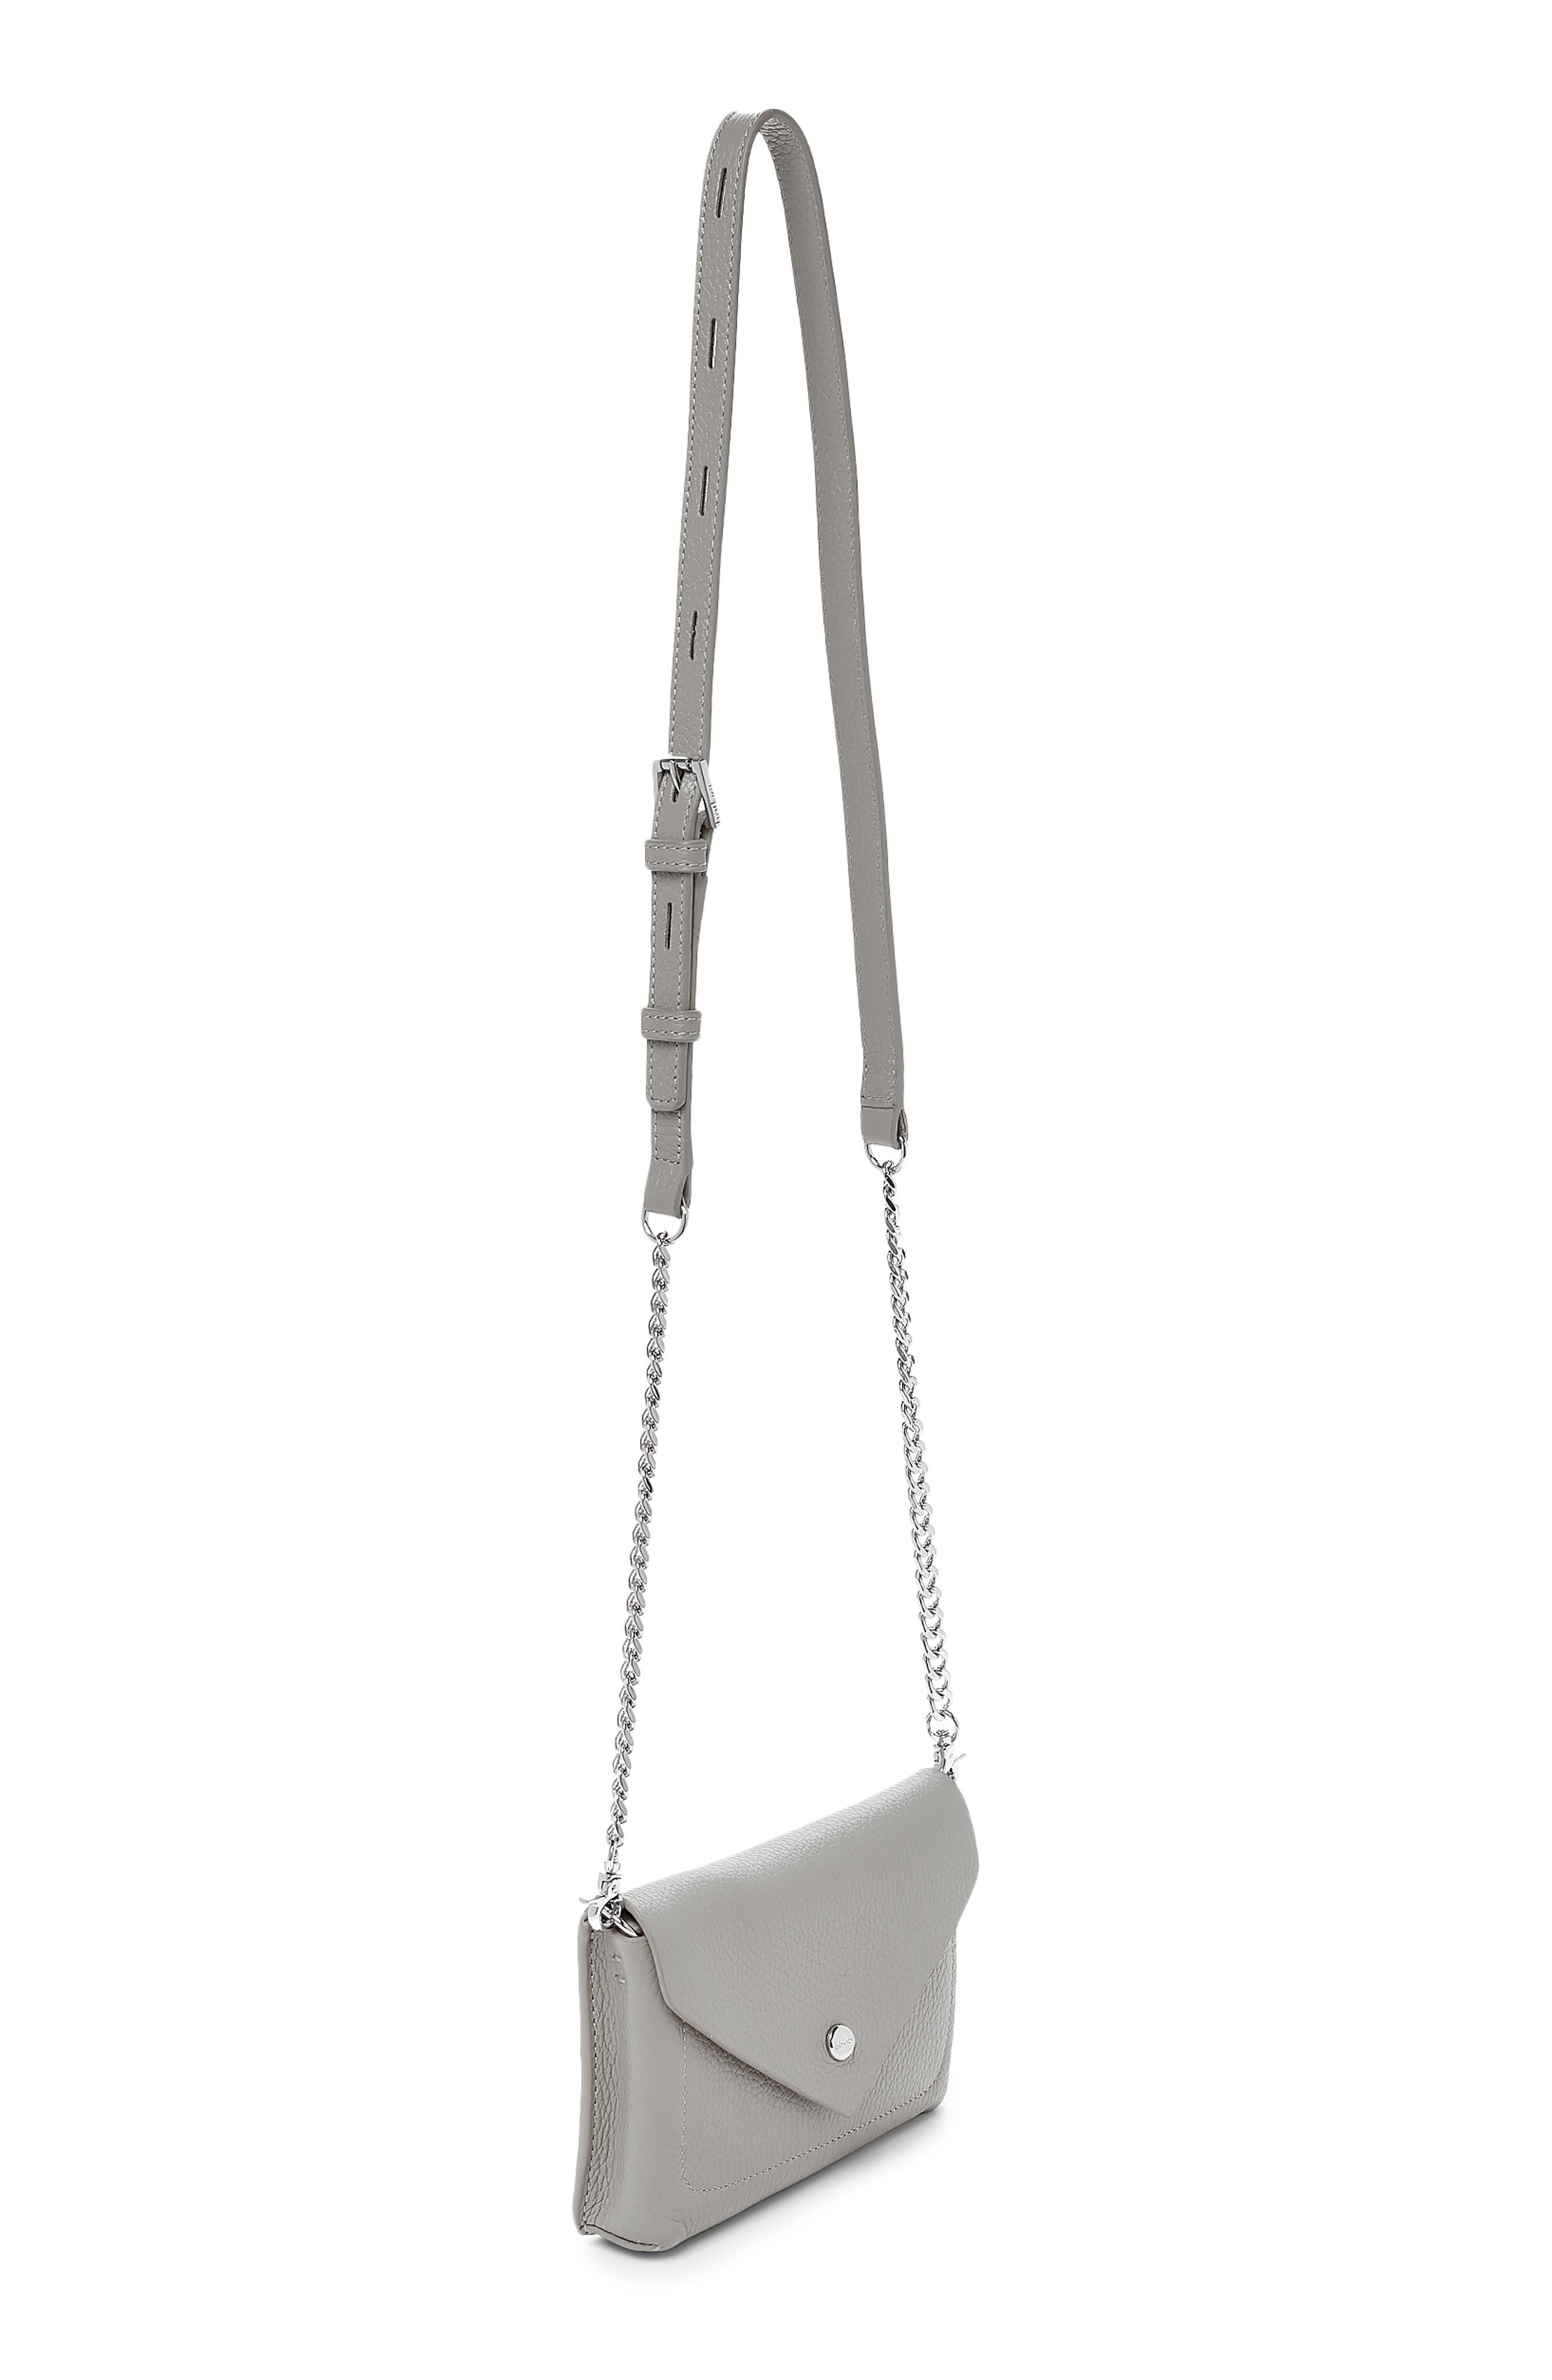 BOTKIER,                             Vivi Calfskin Leather Belt Bag,                             Alternate thumbnail 4, color,                             SILVER GREY